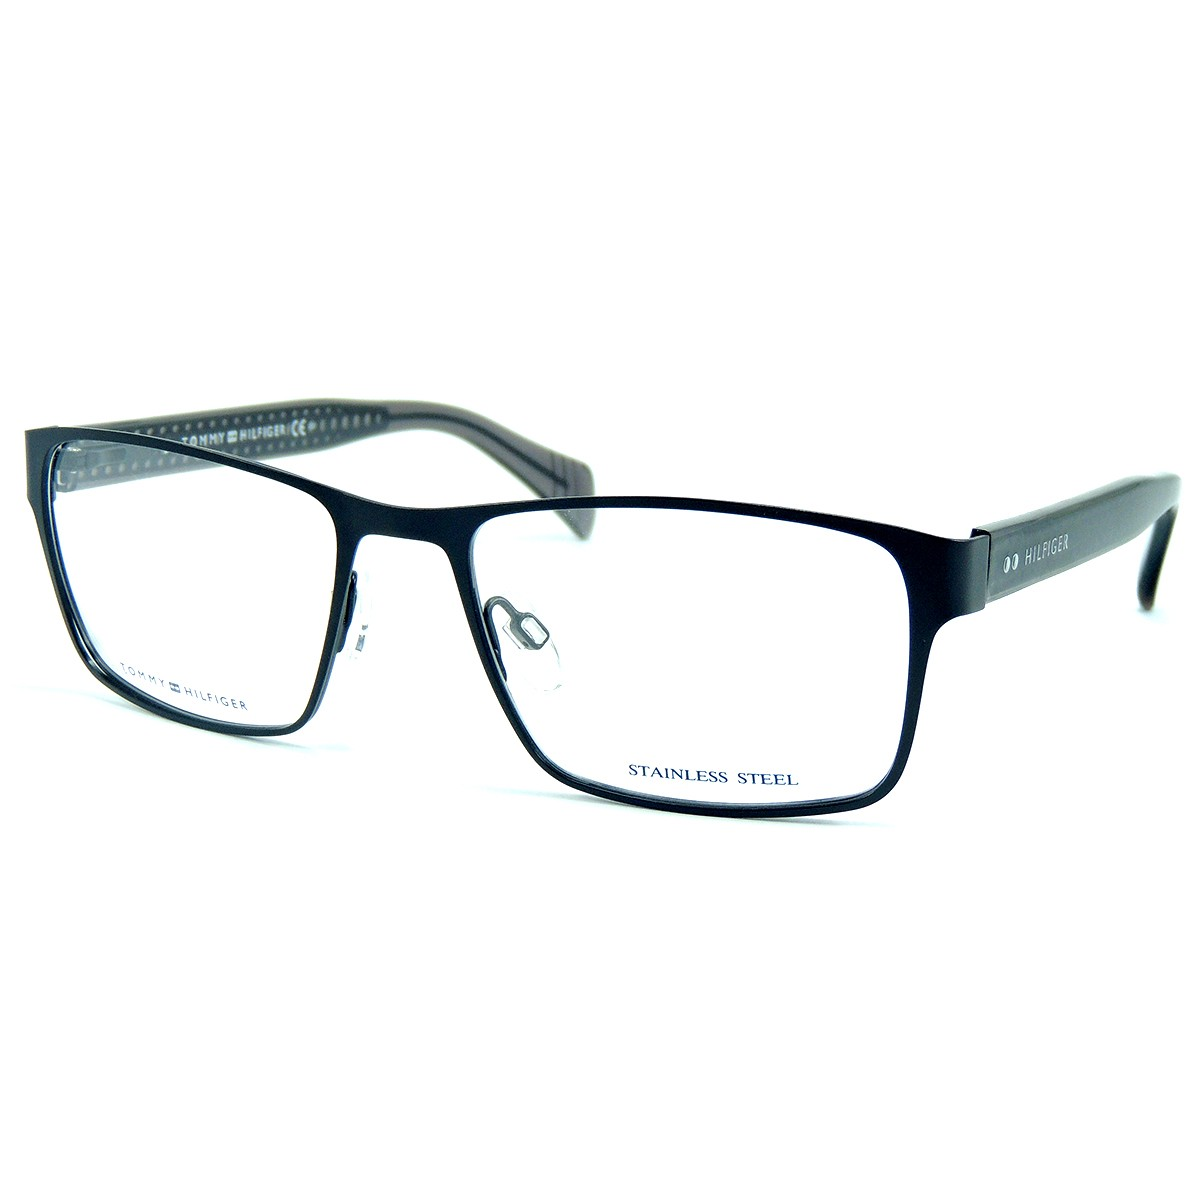 5eee2d709 Compre Óculos de Grau Tommy Hilfiger em 10X | Tri-Jóia Shop